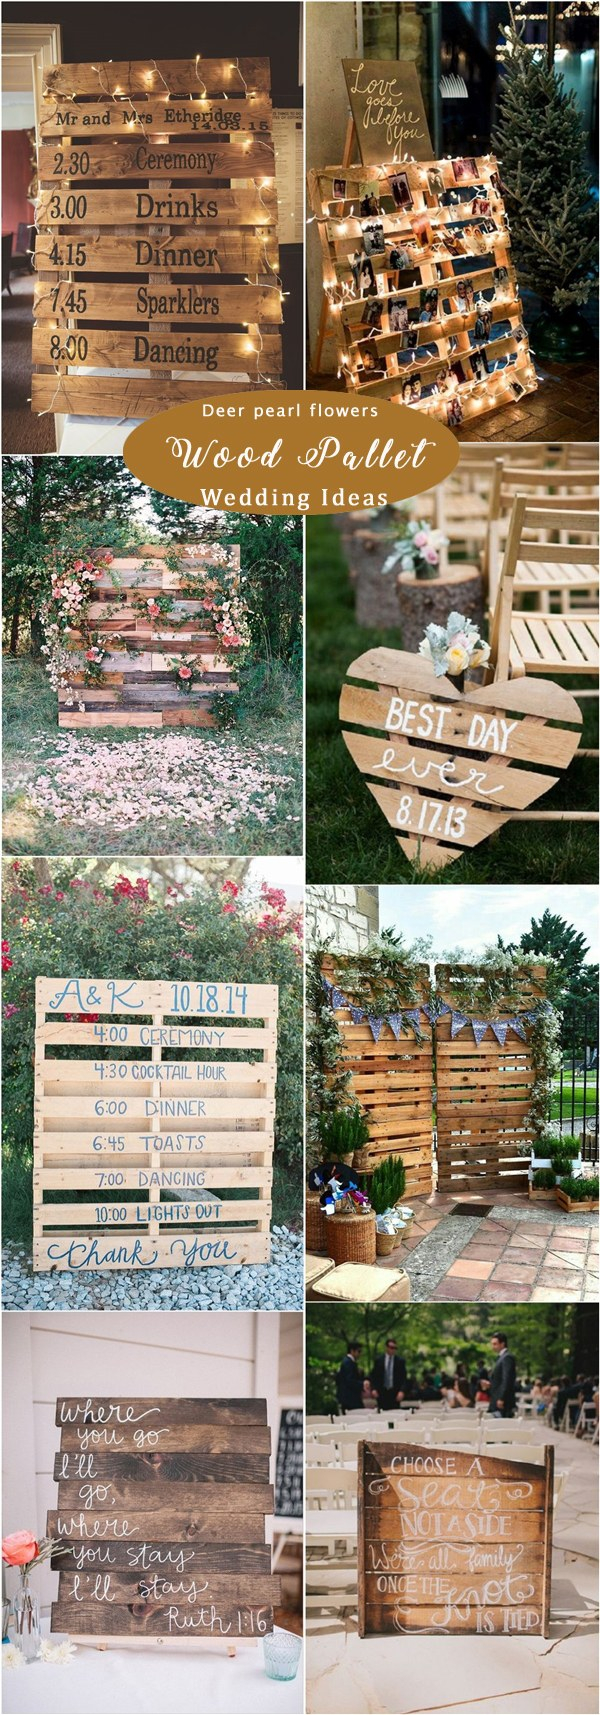 Pallets Wedding Ideas 65 Rustic Woodsy Wedding Decor Ideas For 2019 Deer Pearl Flowers